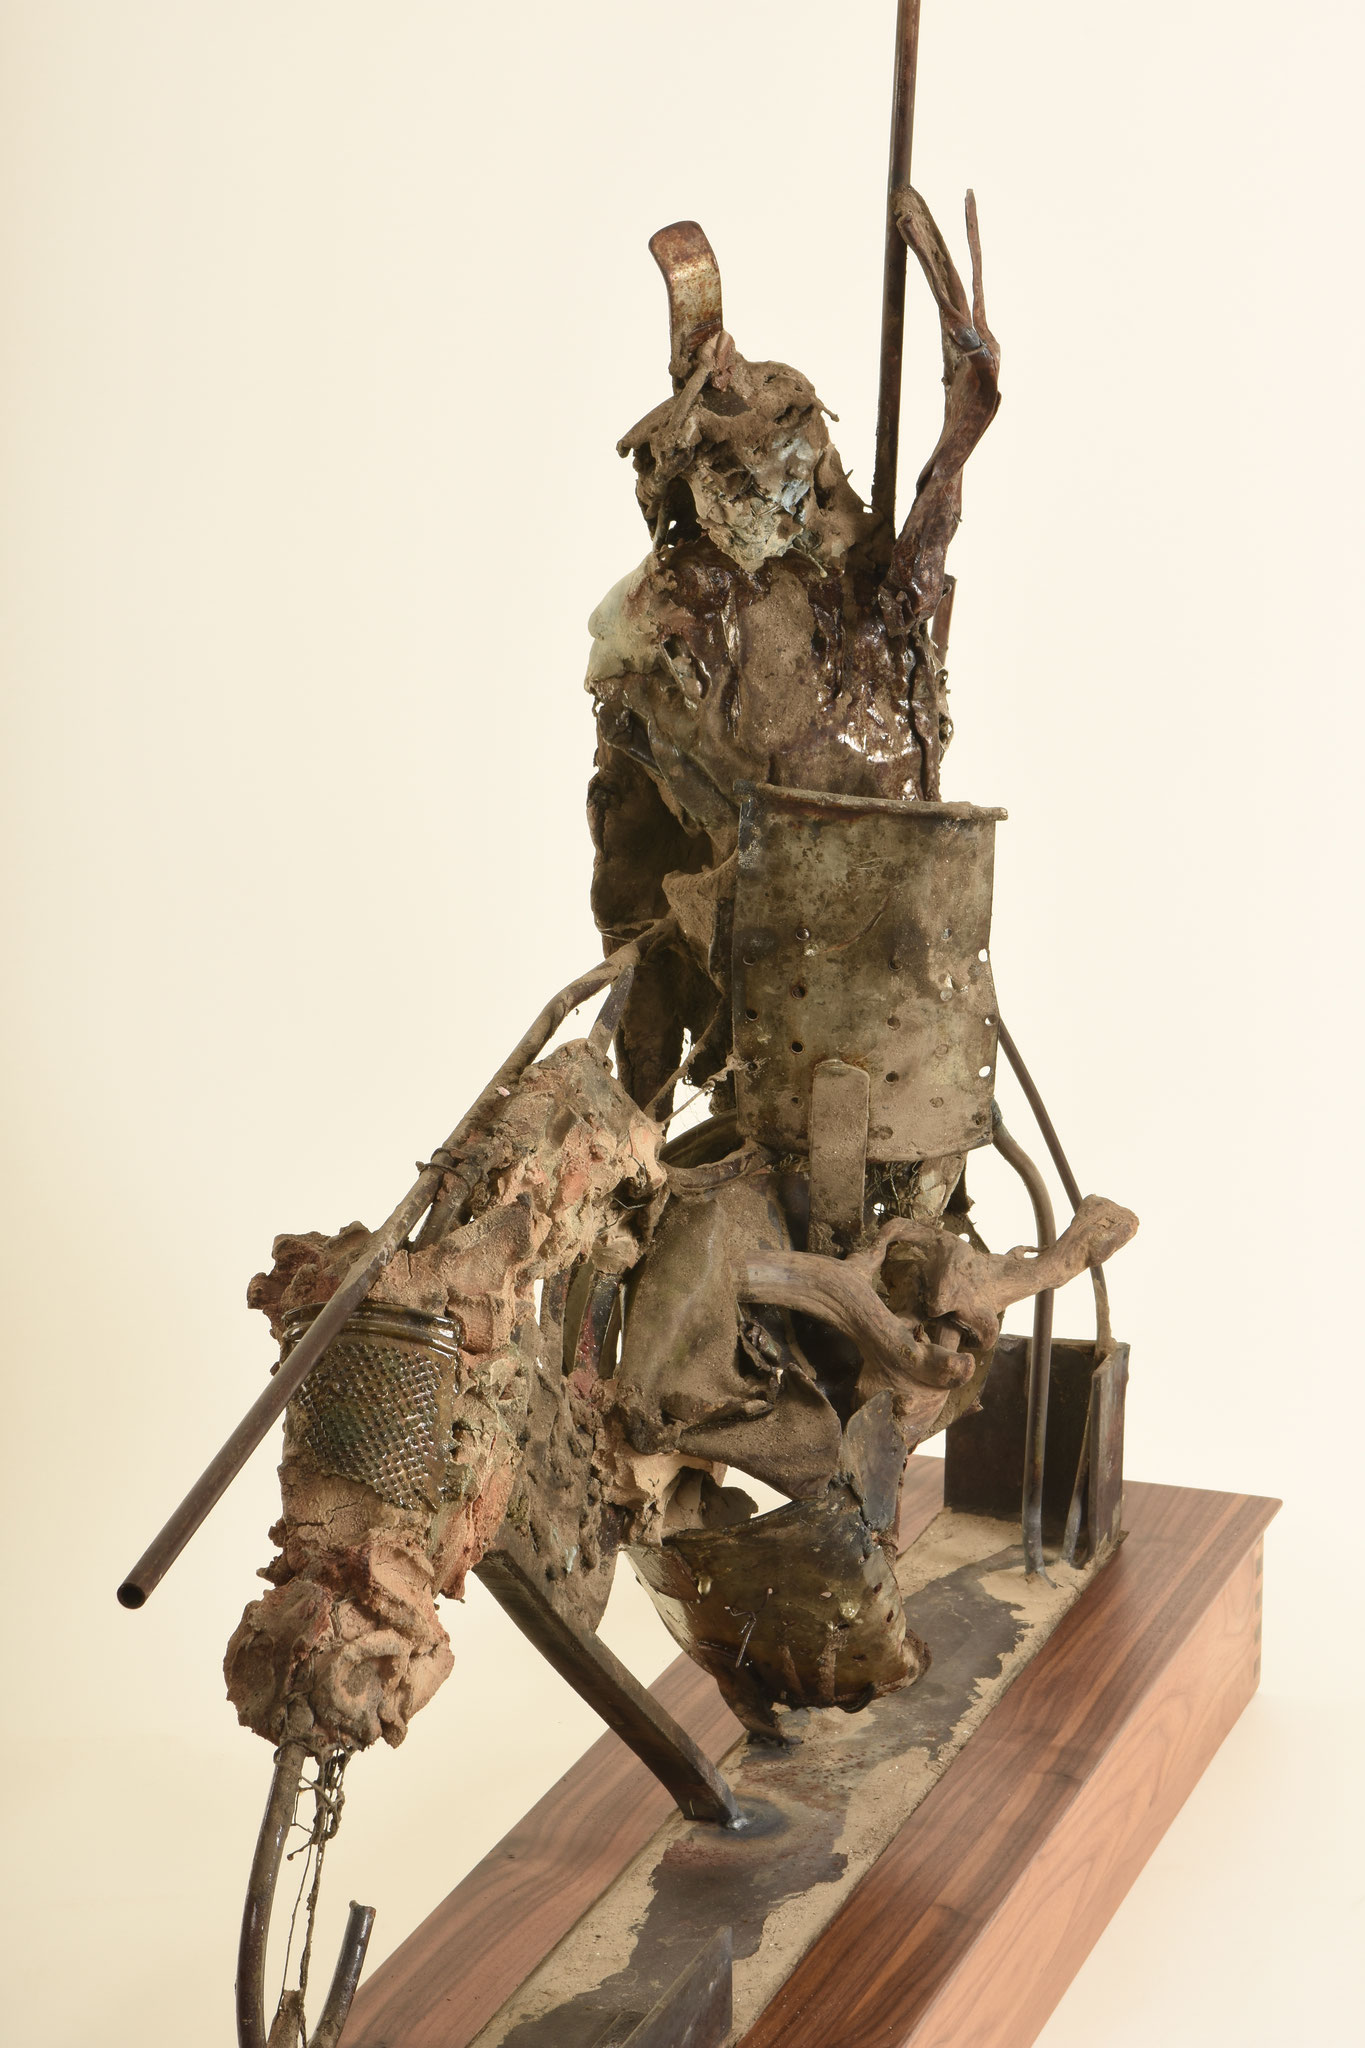 Don Quixote  |   2016  |   Metall, Ton auf Nußbaumsockel  |  135 x 110 x  24cm